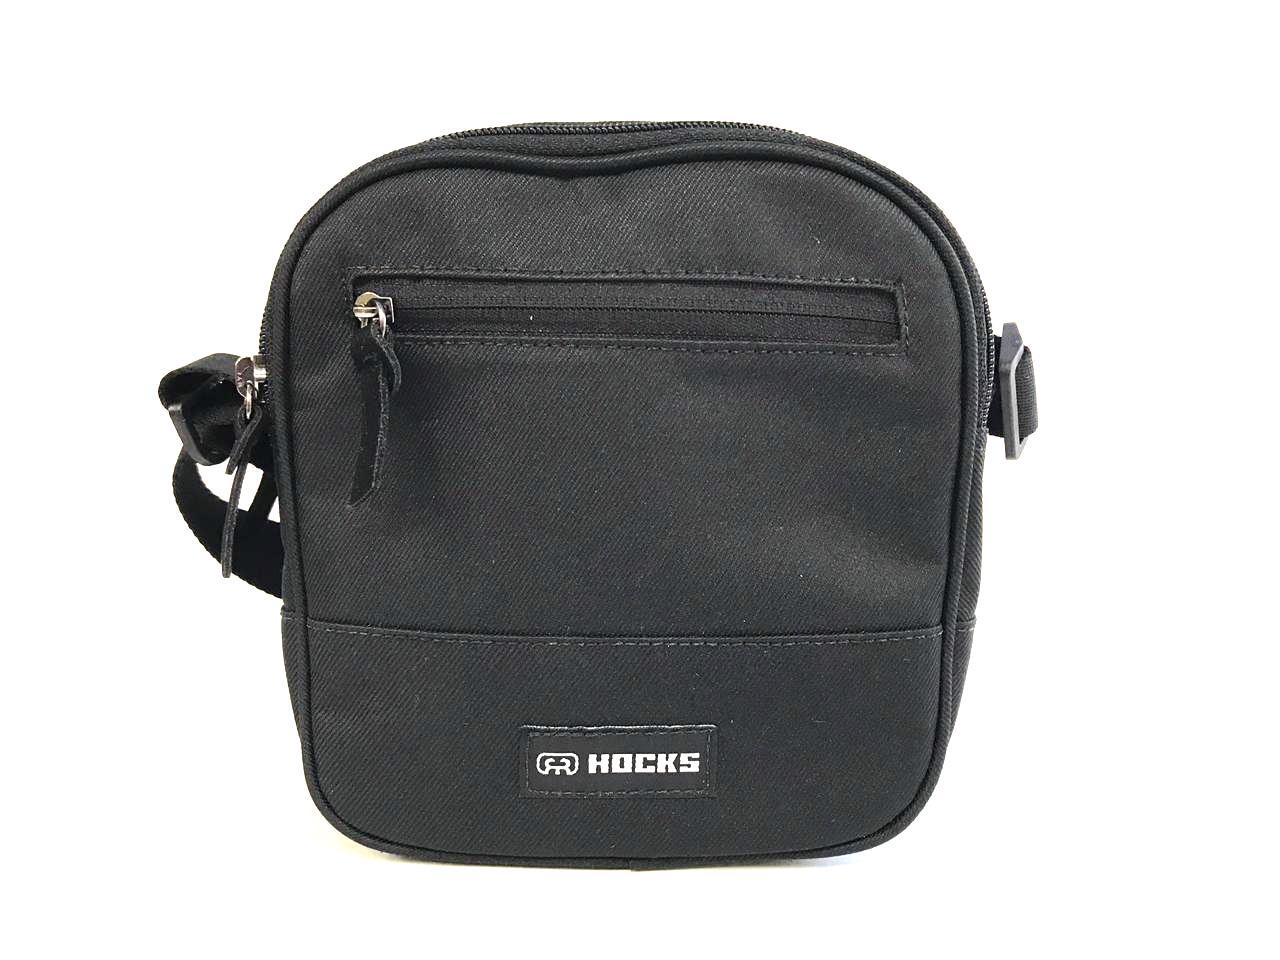 Shoulder Bag Hocks Turista Preta